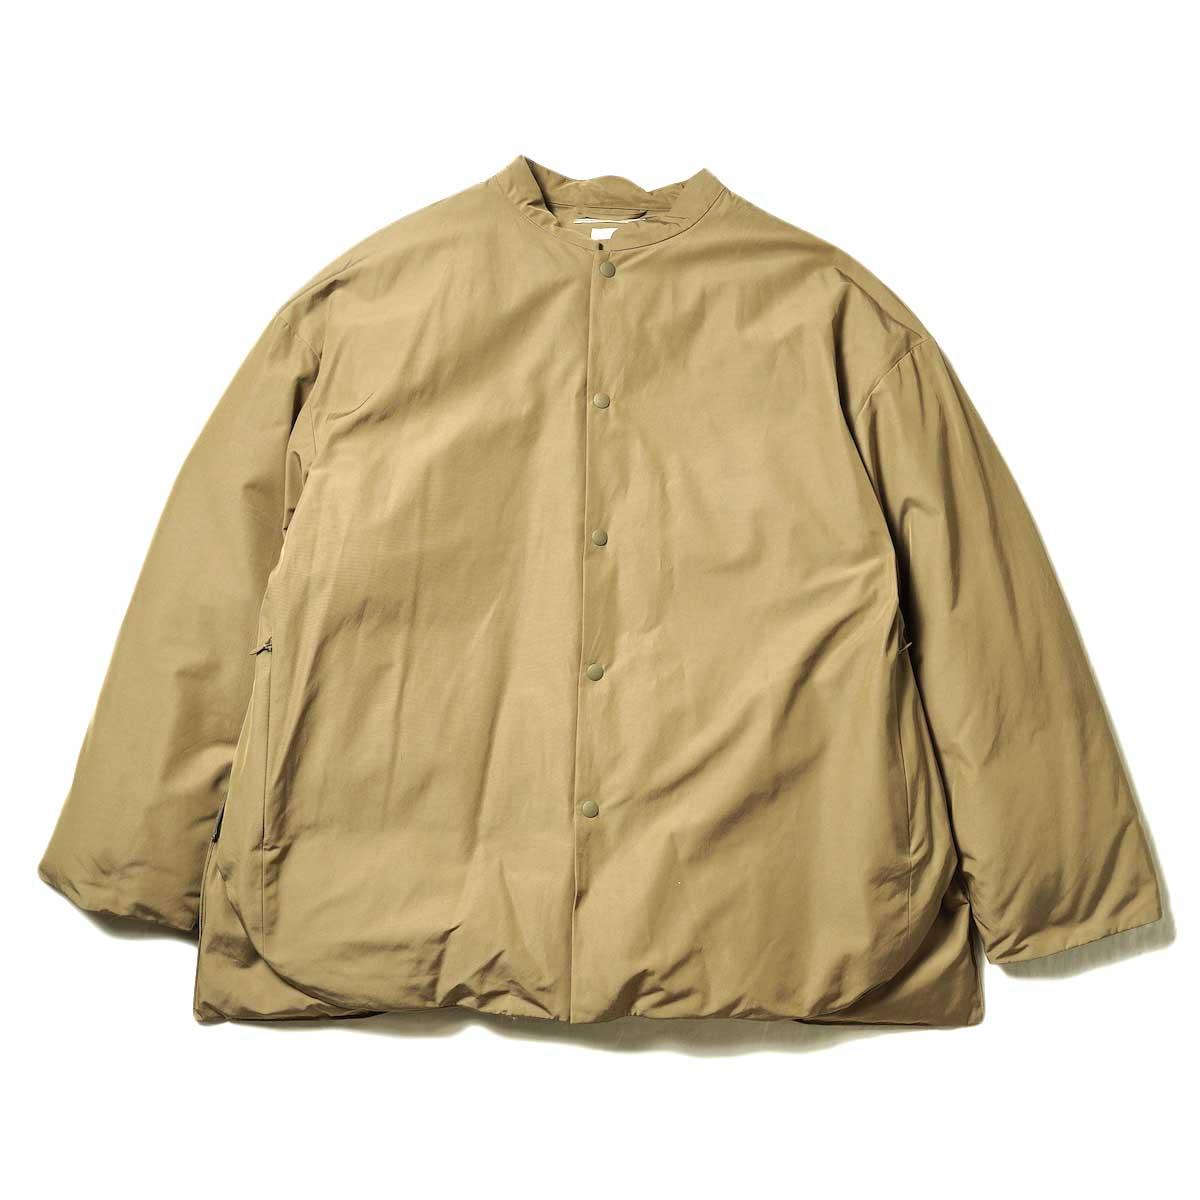 blurhms / Stand-up Collar Down Jacket (Khaki Beige) 正面